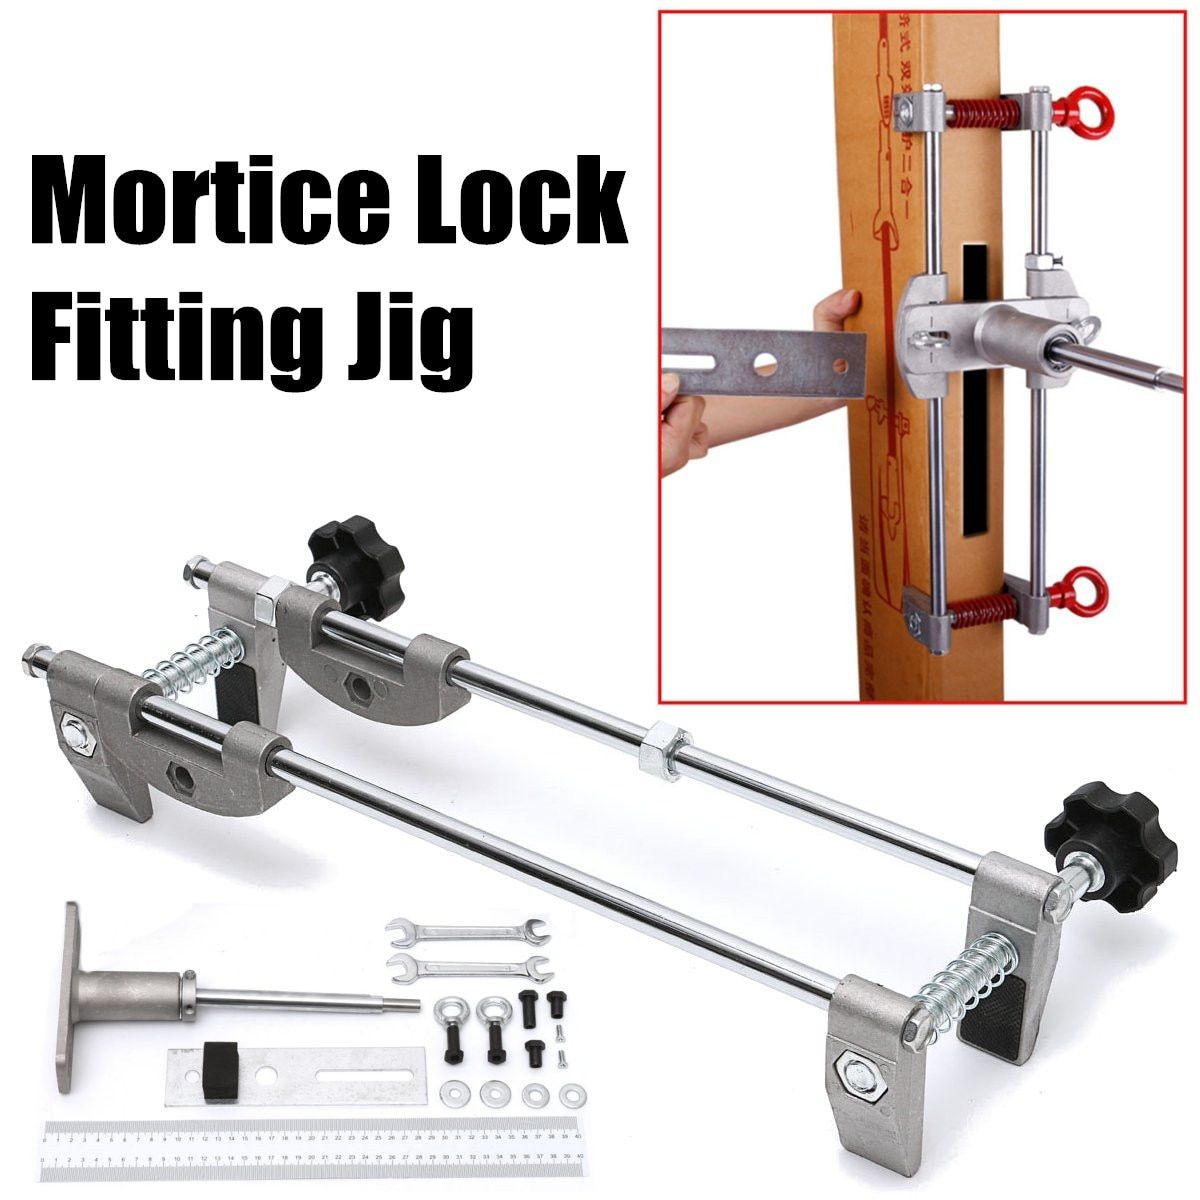 Professional Locksmith Woodworking Door Lock Mortiser Kit Hole Saw Opener Installation Mortising Jig Tool Maintenance Set